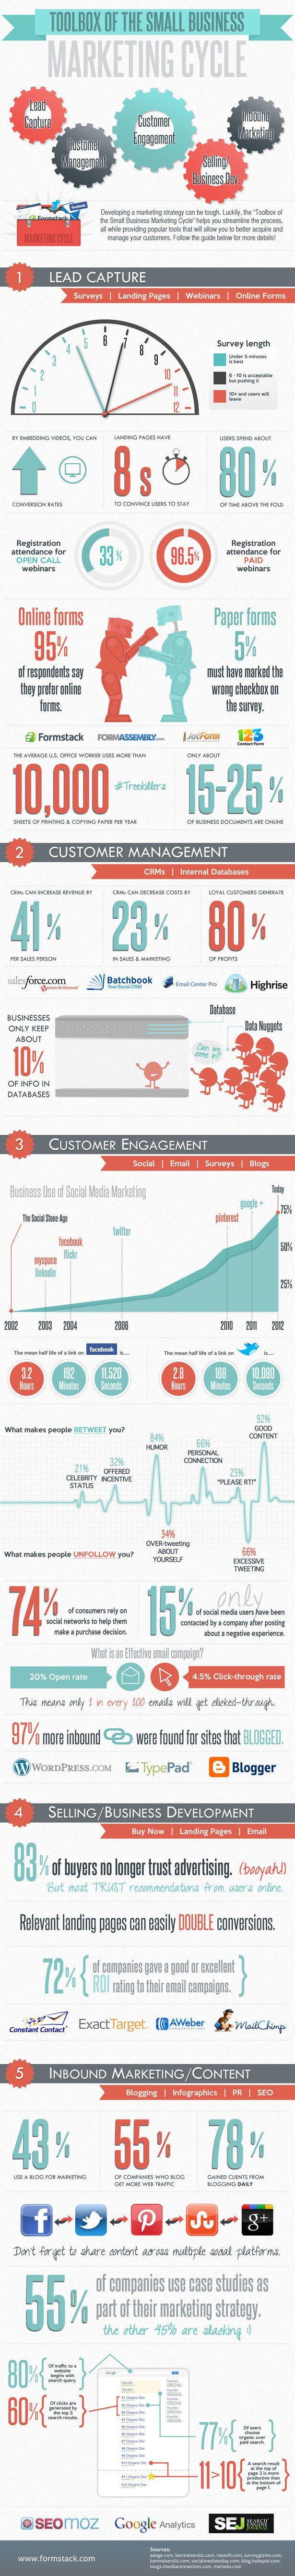 Small Business Marketing Tactics #Infographic  www.socialmediamamma.com